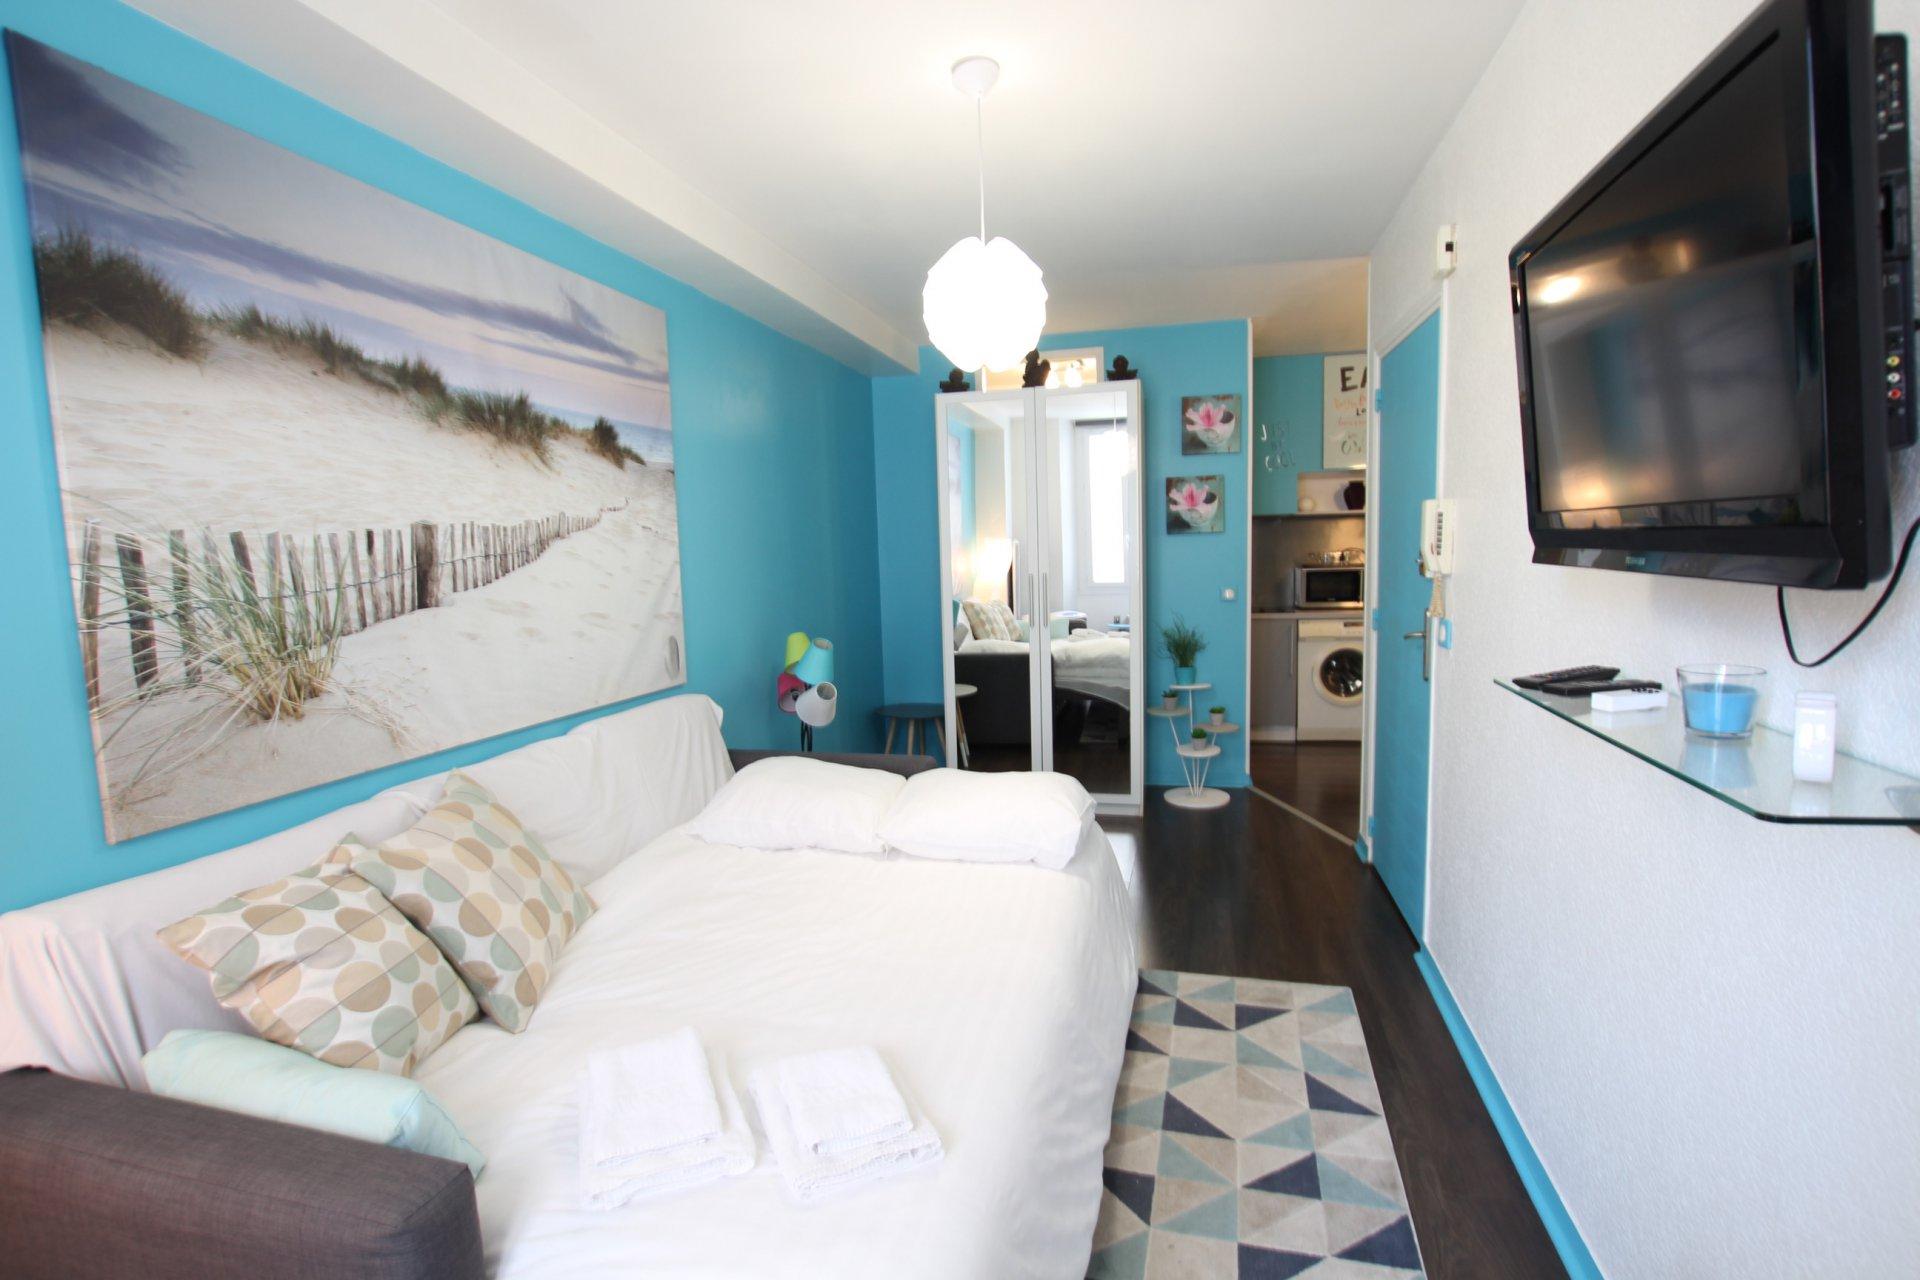 Affitto stagionale Monolocale - Cannes Suquet